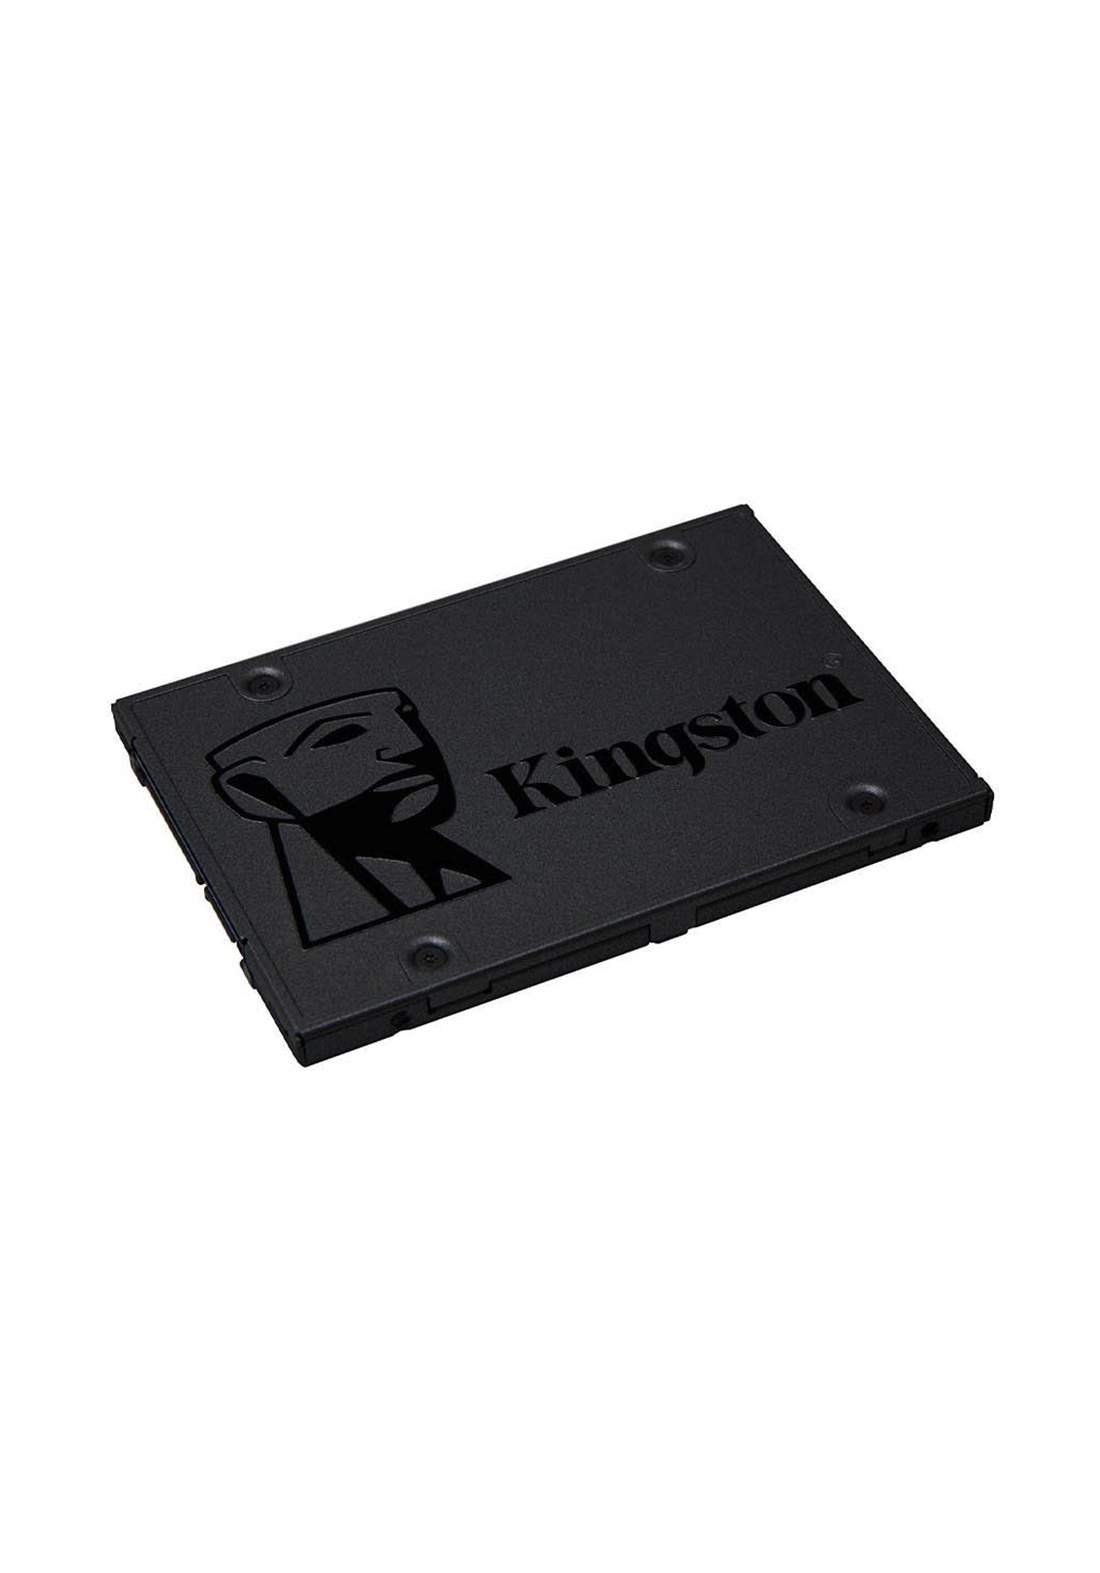 "Kingston A400 240GB SATA 3 2.5"" Internal SSD SA400S37"